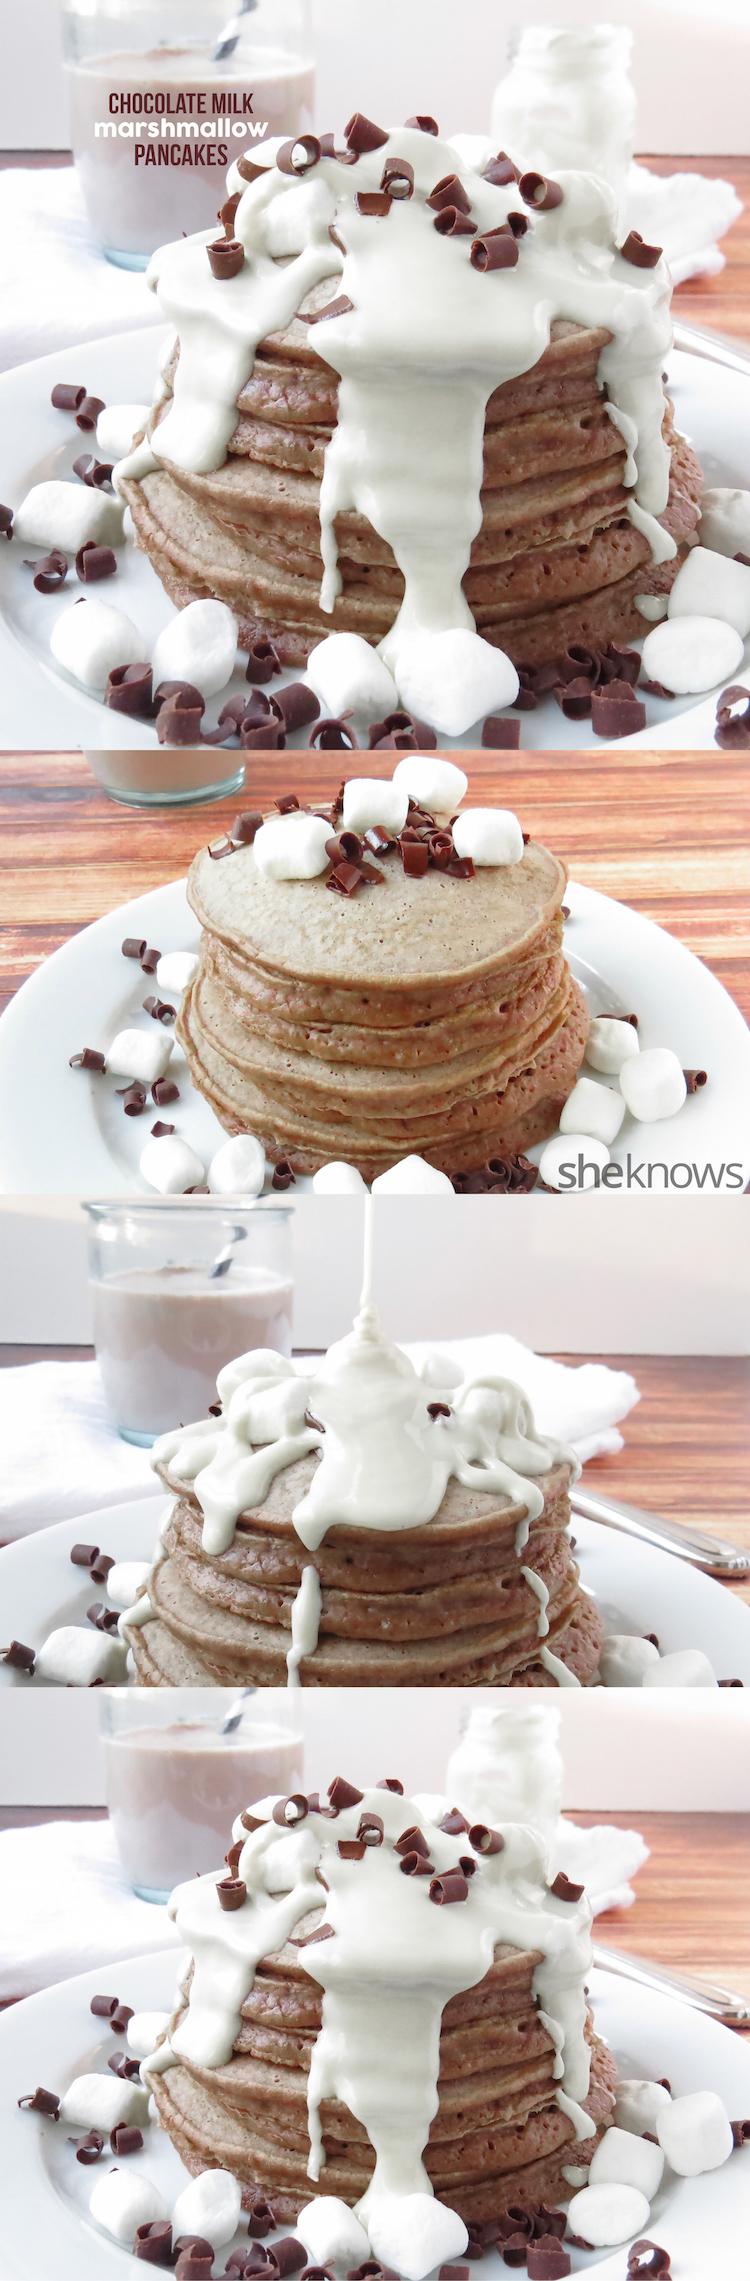 Chocolate Milk Marshmallow Pancakes